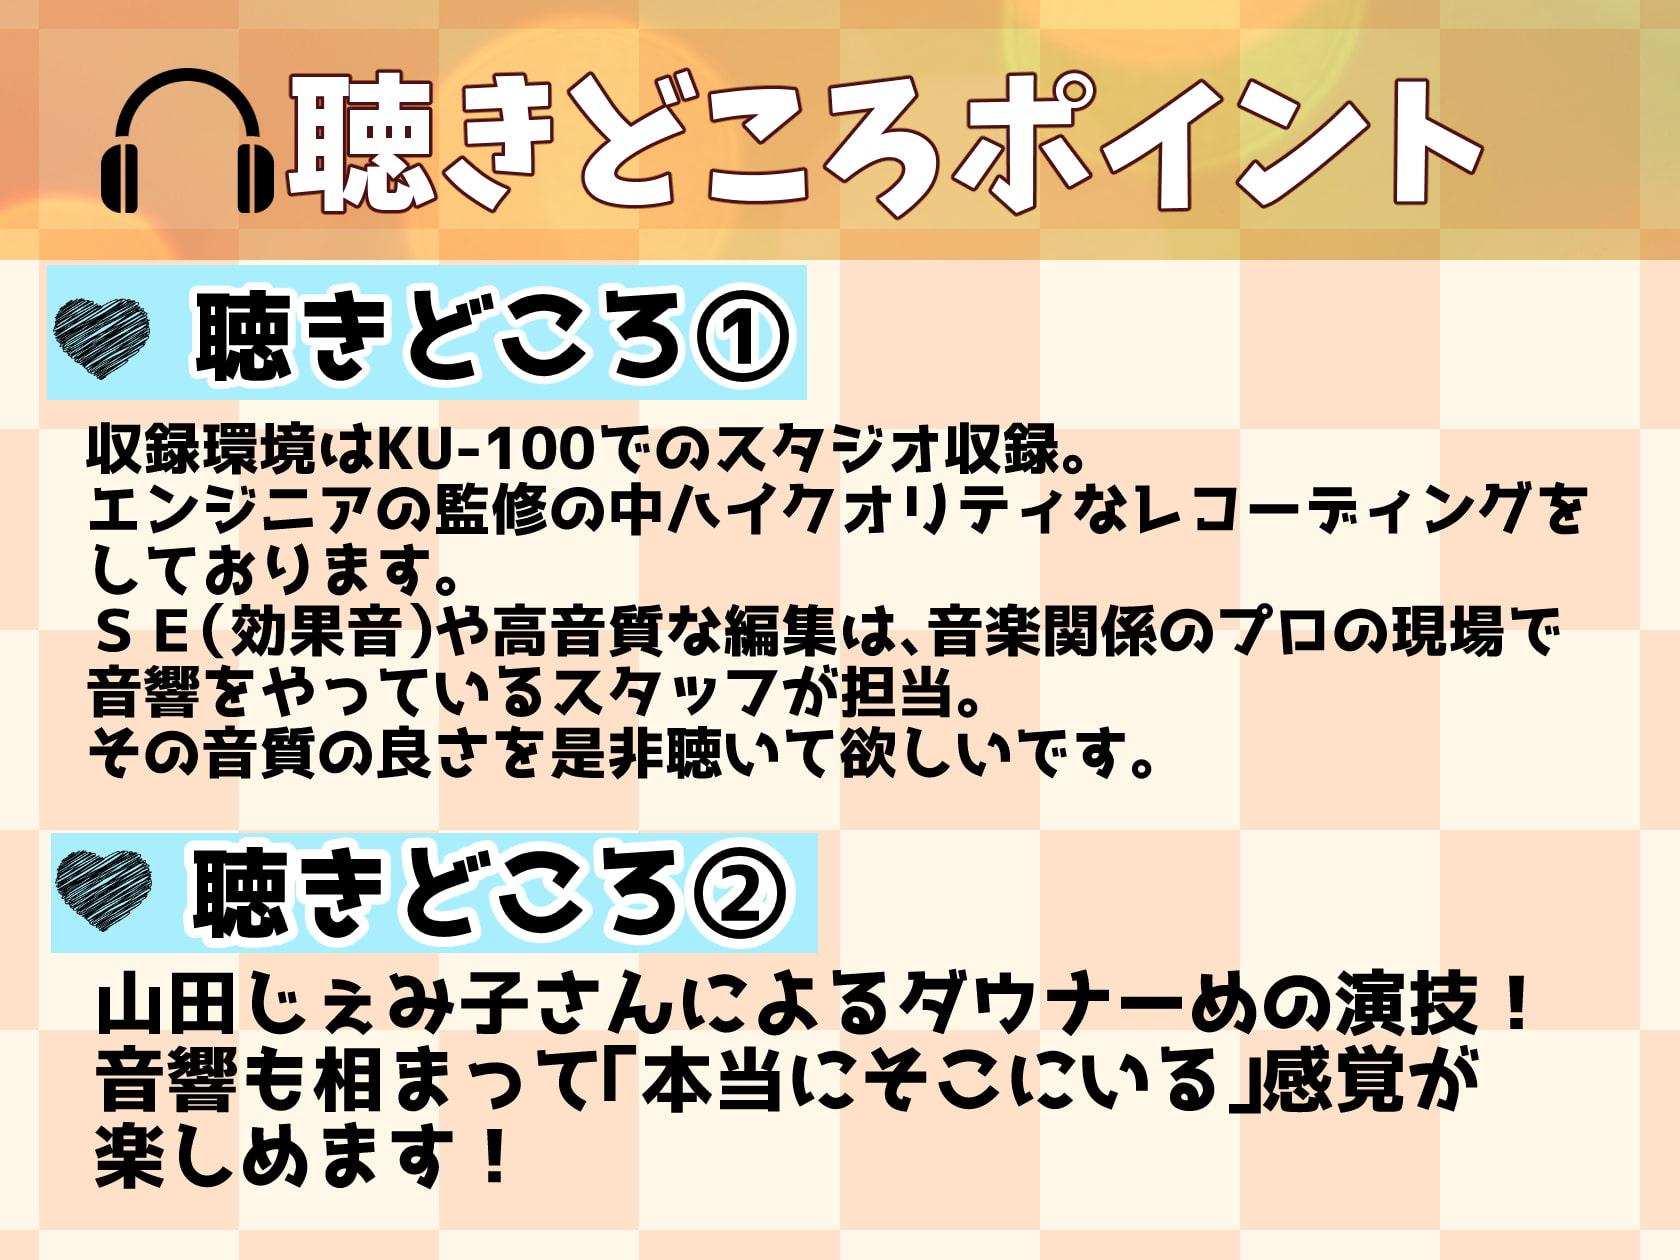 【KU-100】ダウナー系サキュバスの全人類わがままマゾ化プログラム